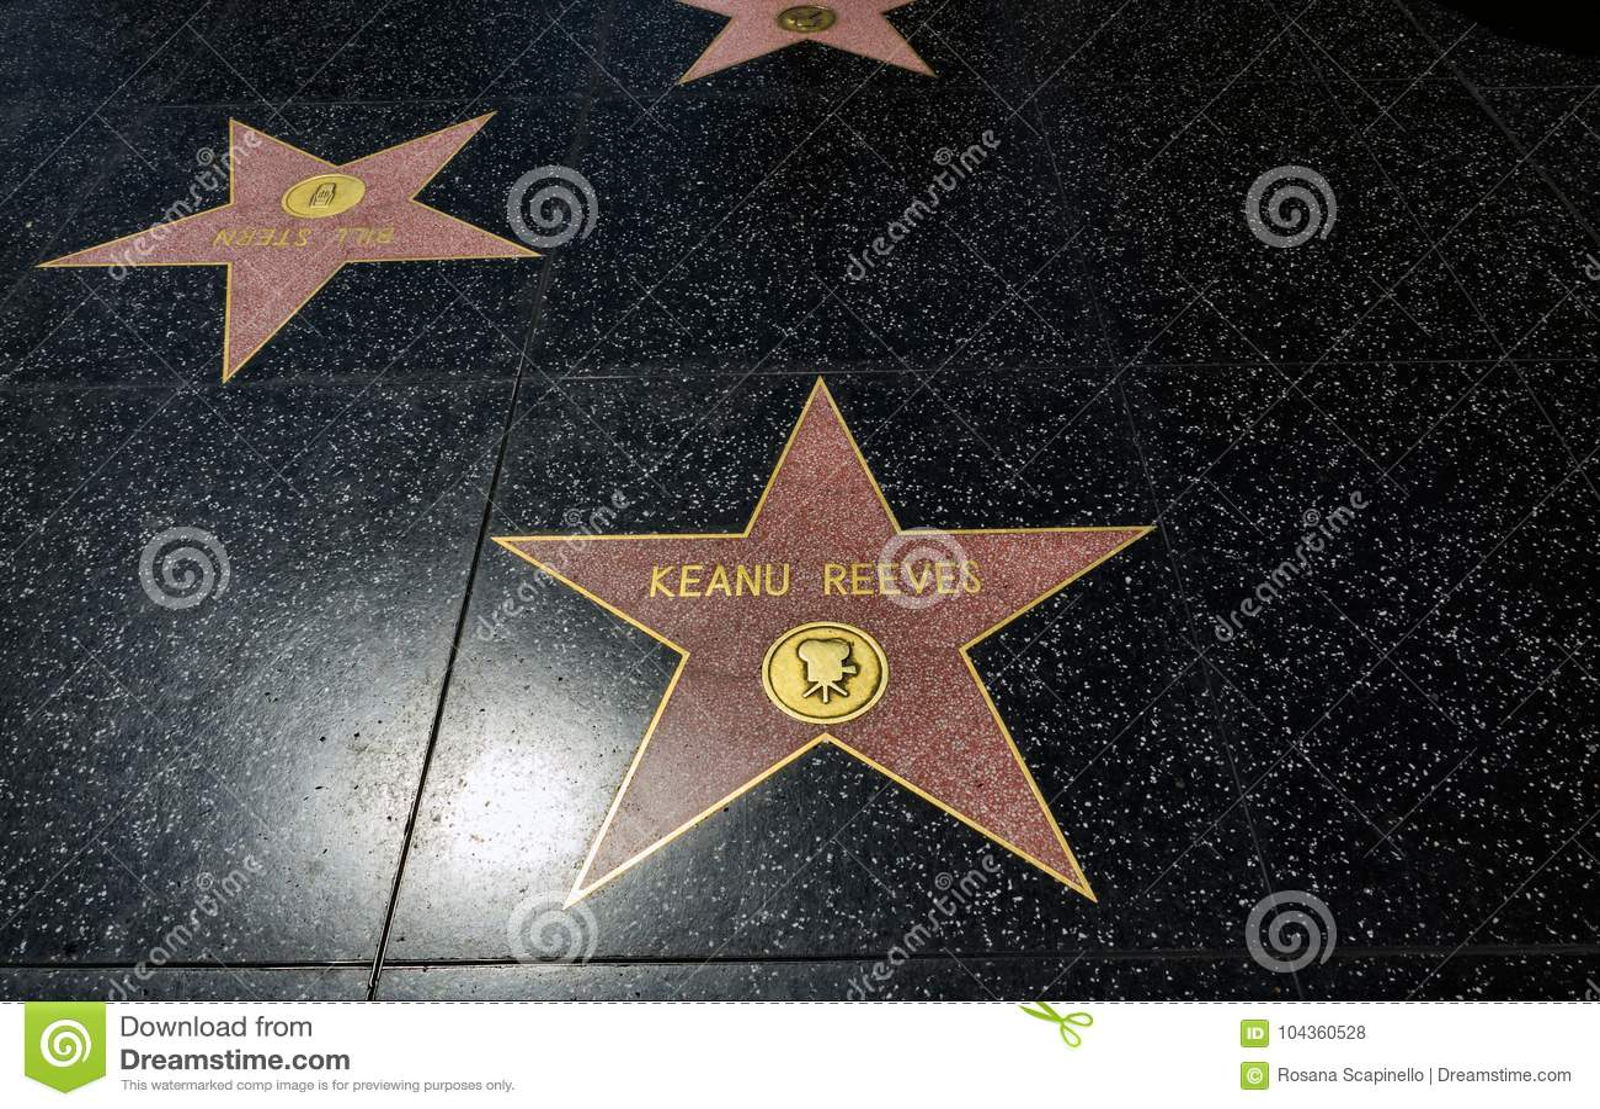 Étoile du ` s de Keanu Reeves, promenade de Hollywood de la renommée - 11 août 2017 - Hollywood Boulevard, Los Angeles, la Califo